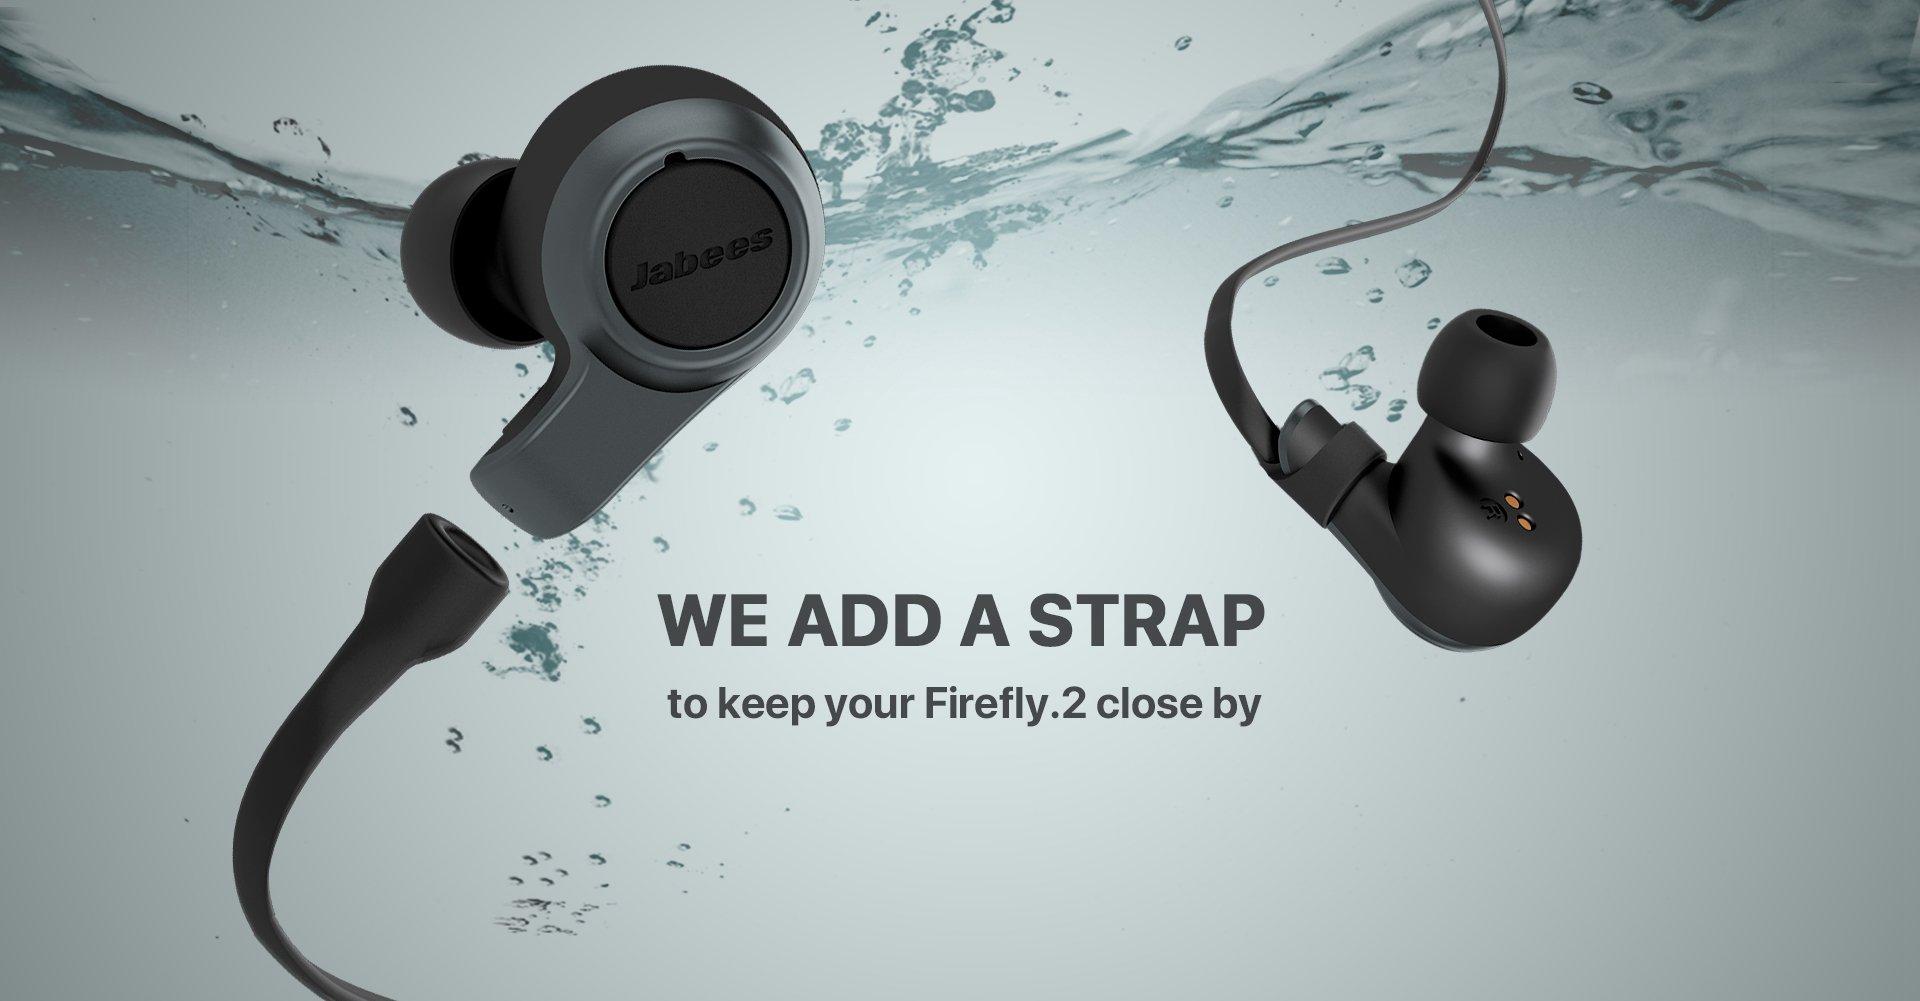 Jabees Firefly 2 Black Touch TWS Earbuds Waterproof & Dustproof IPX7 4